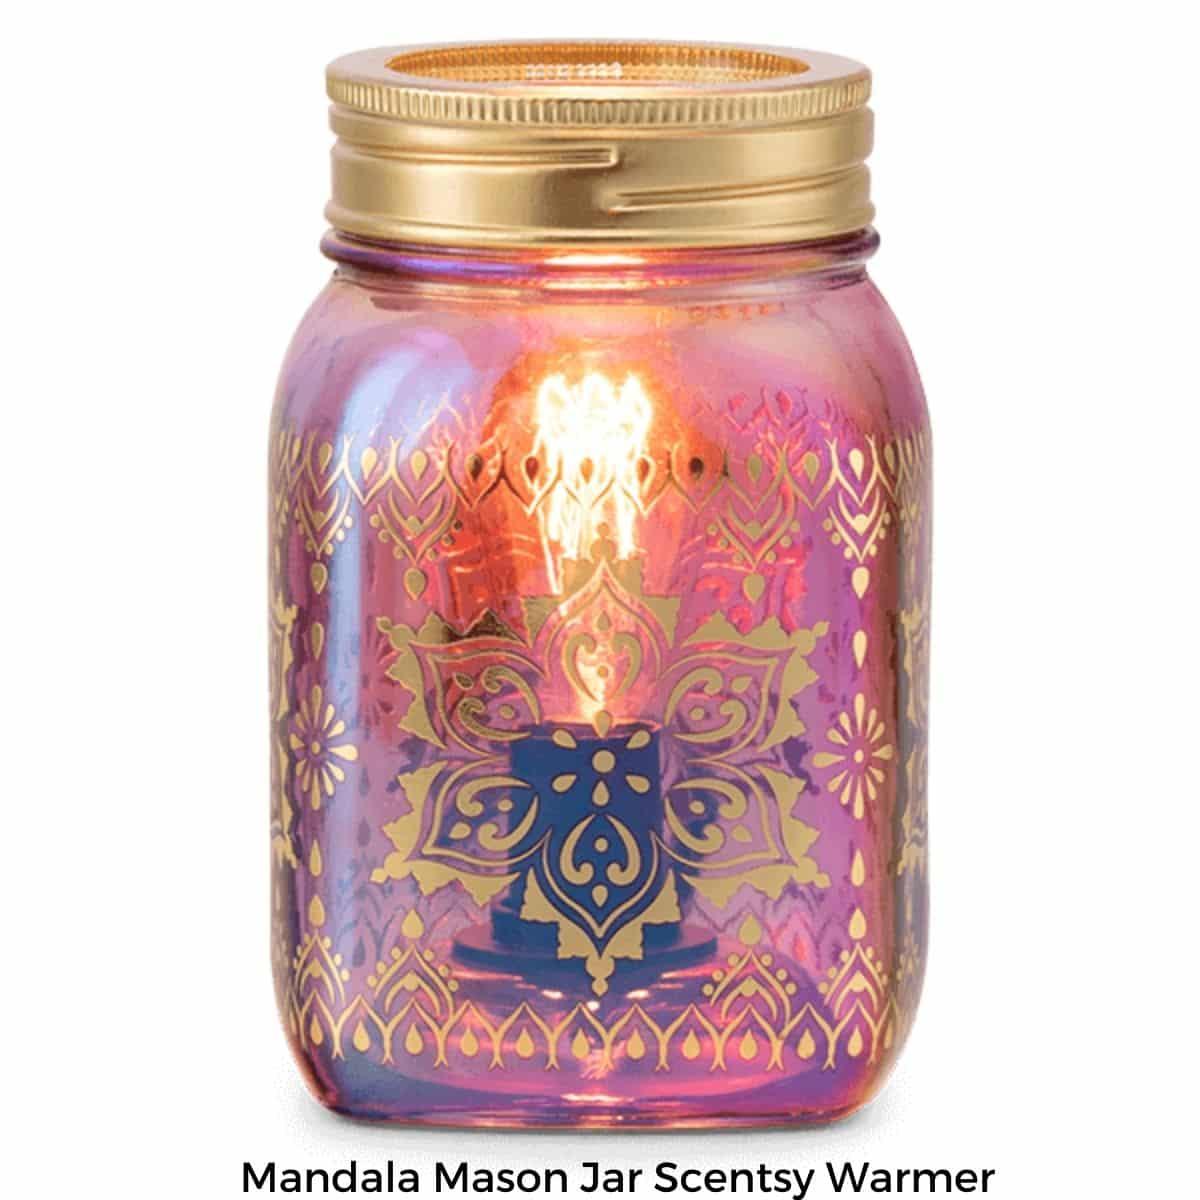 Mandala Mason Jar Scentsy Warmer | Summer 2021